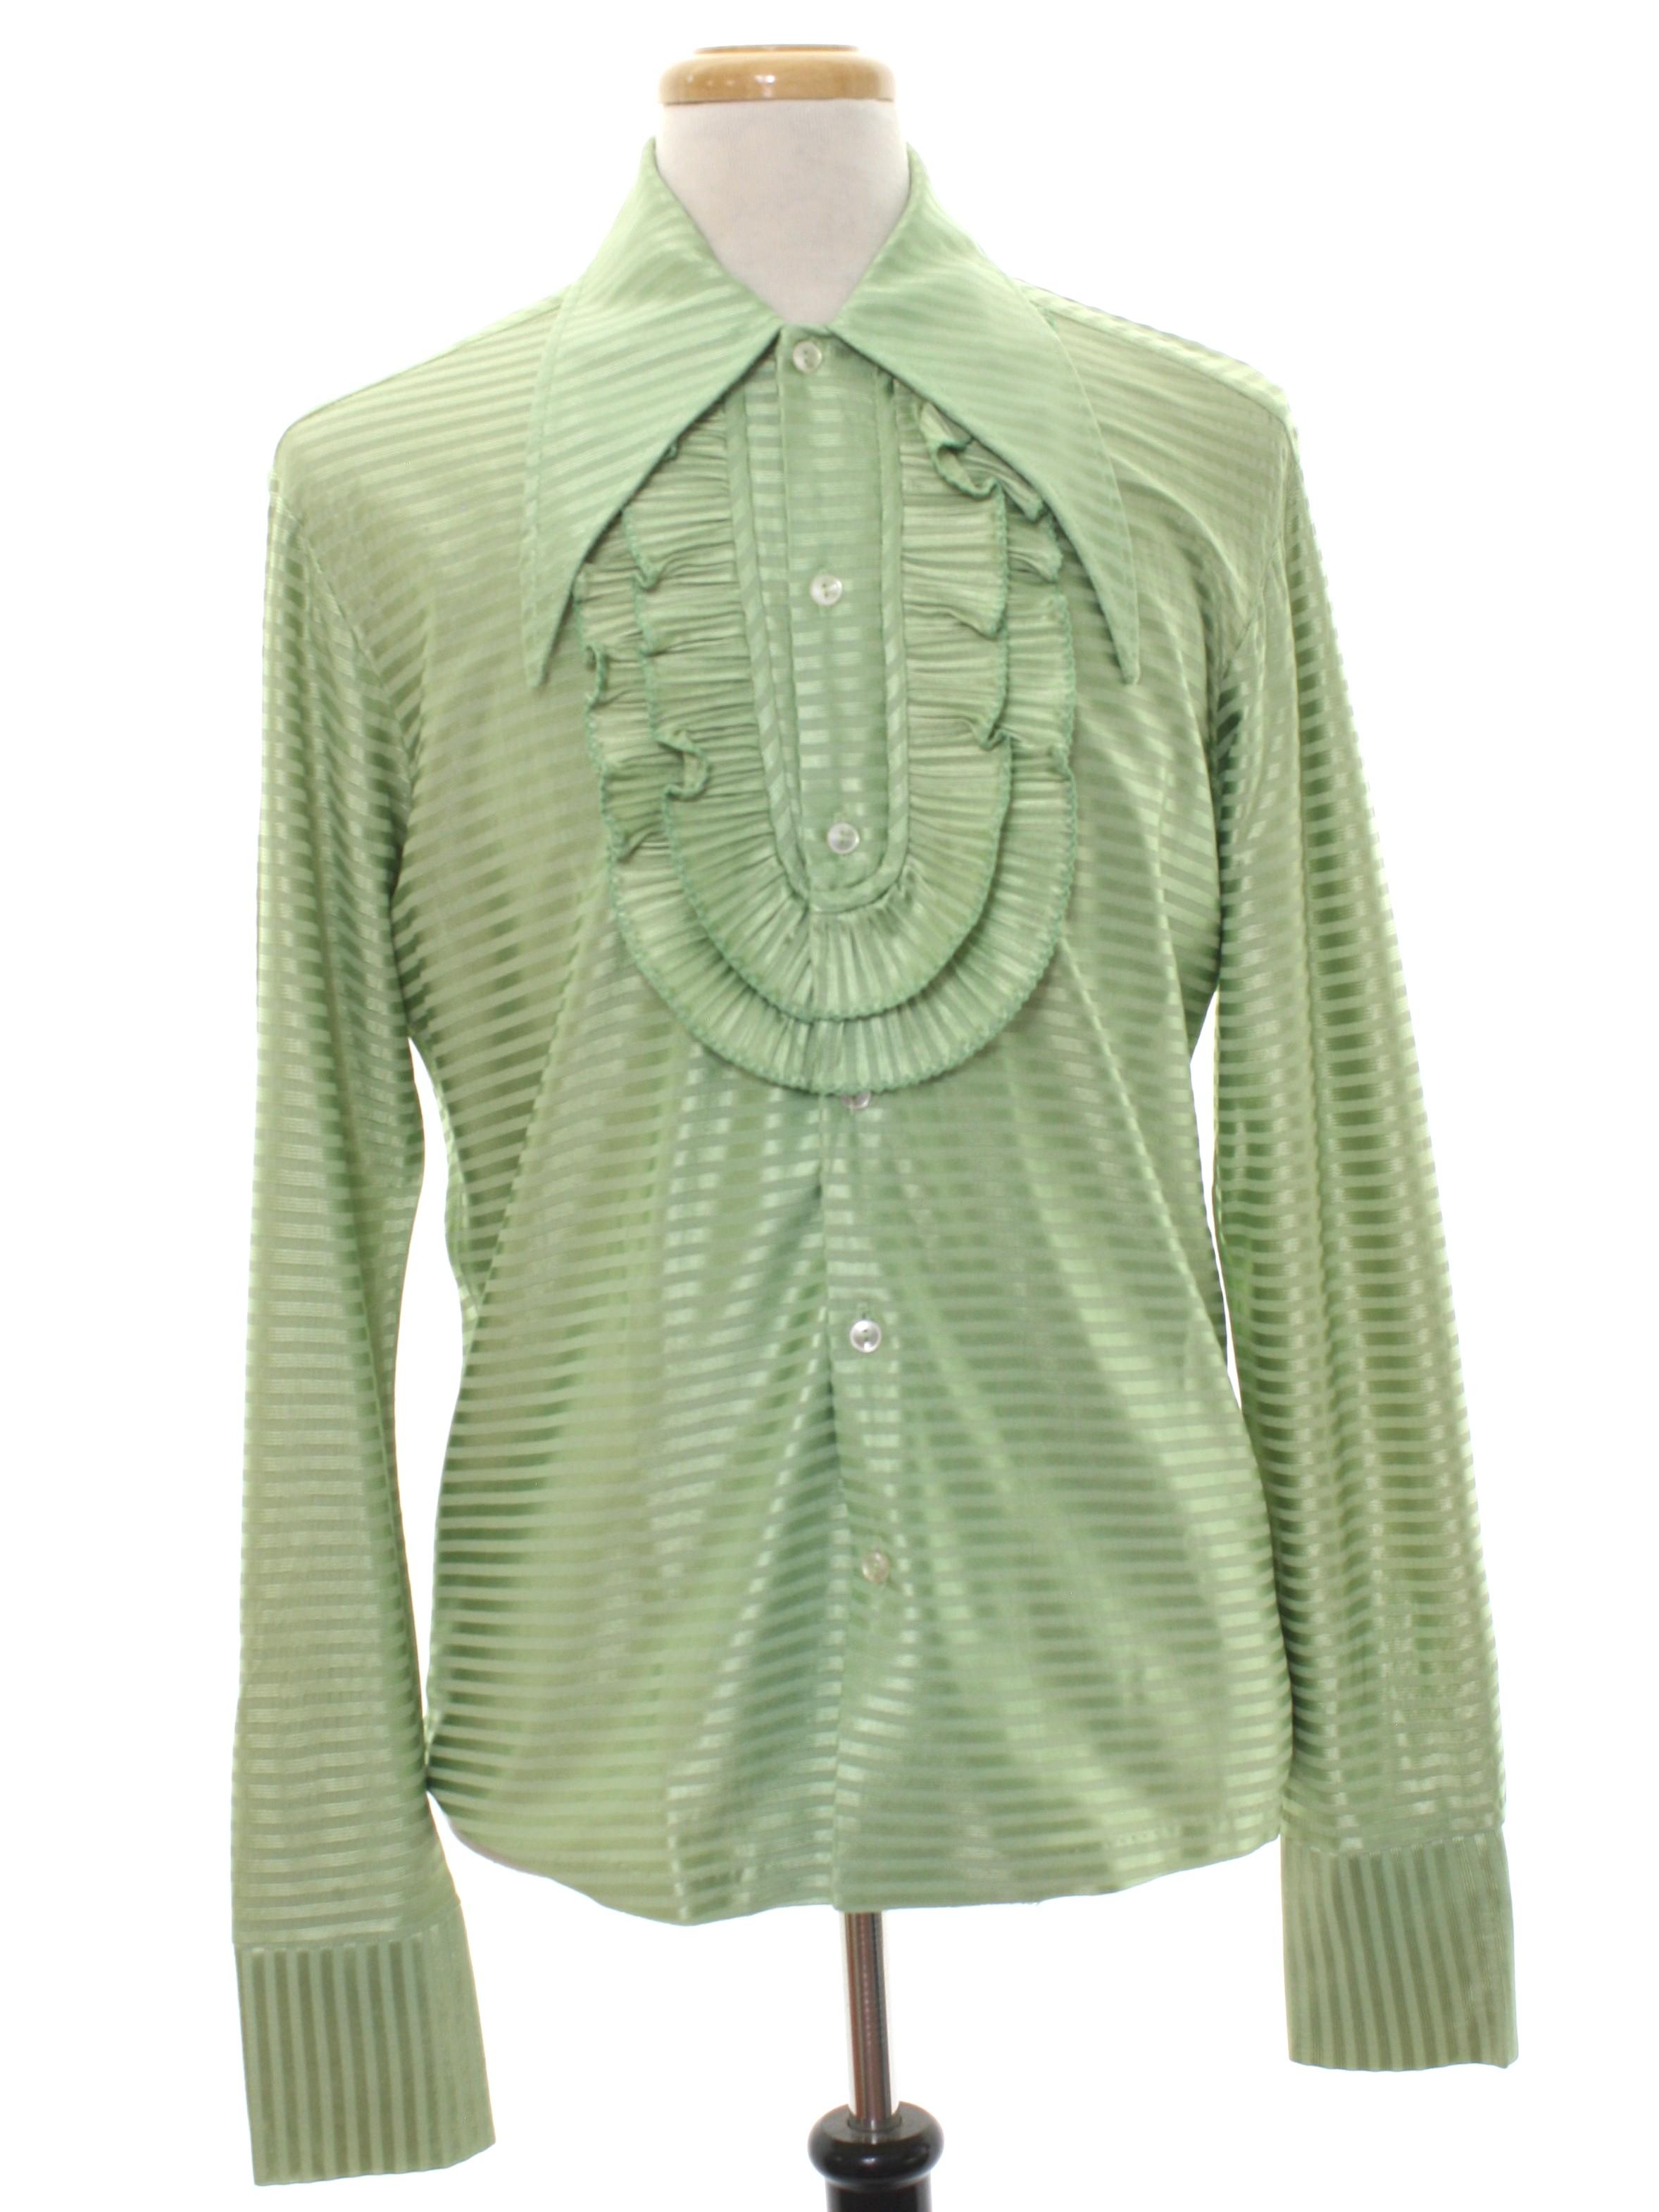 Retro 60s Shirt Mens Fashion Sears The Mens Store Late 60s Or